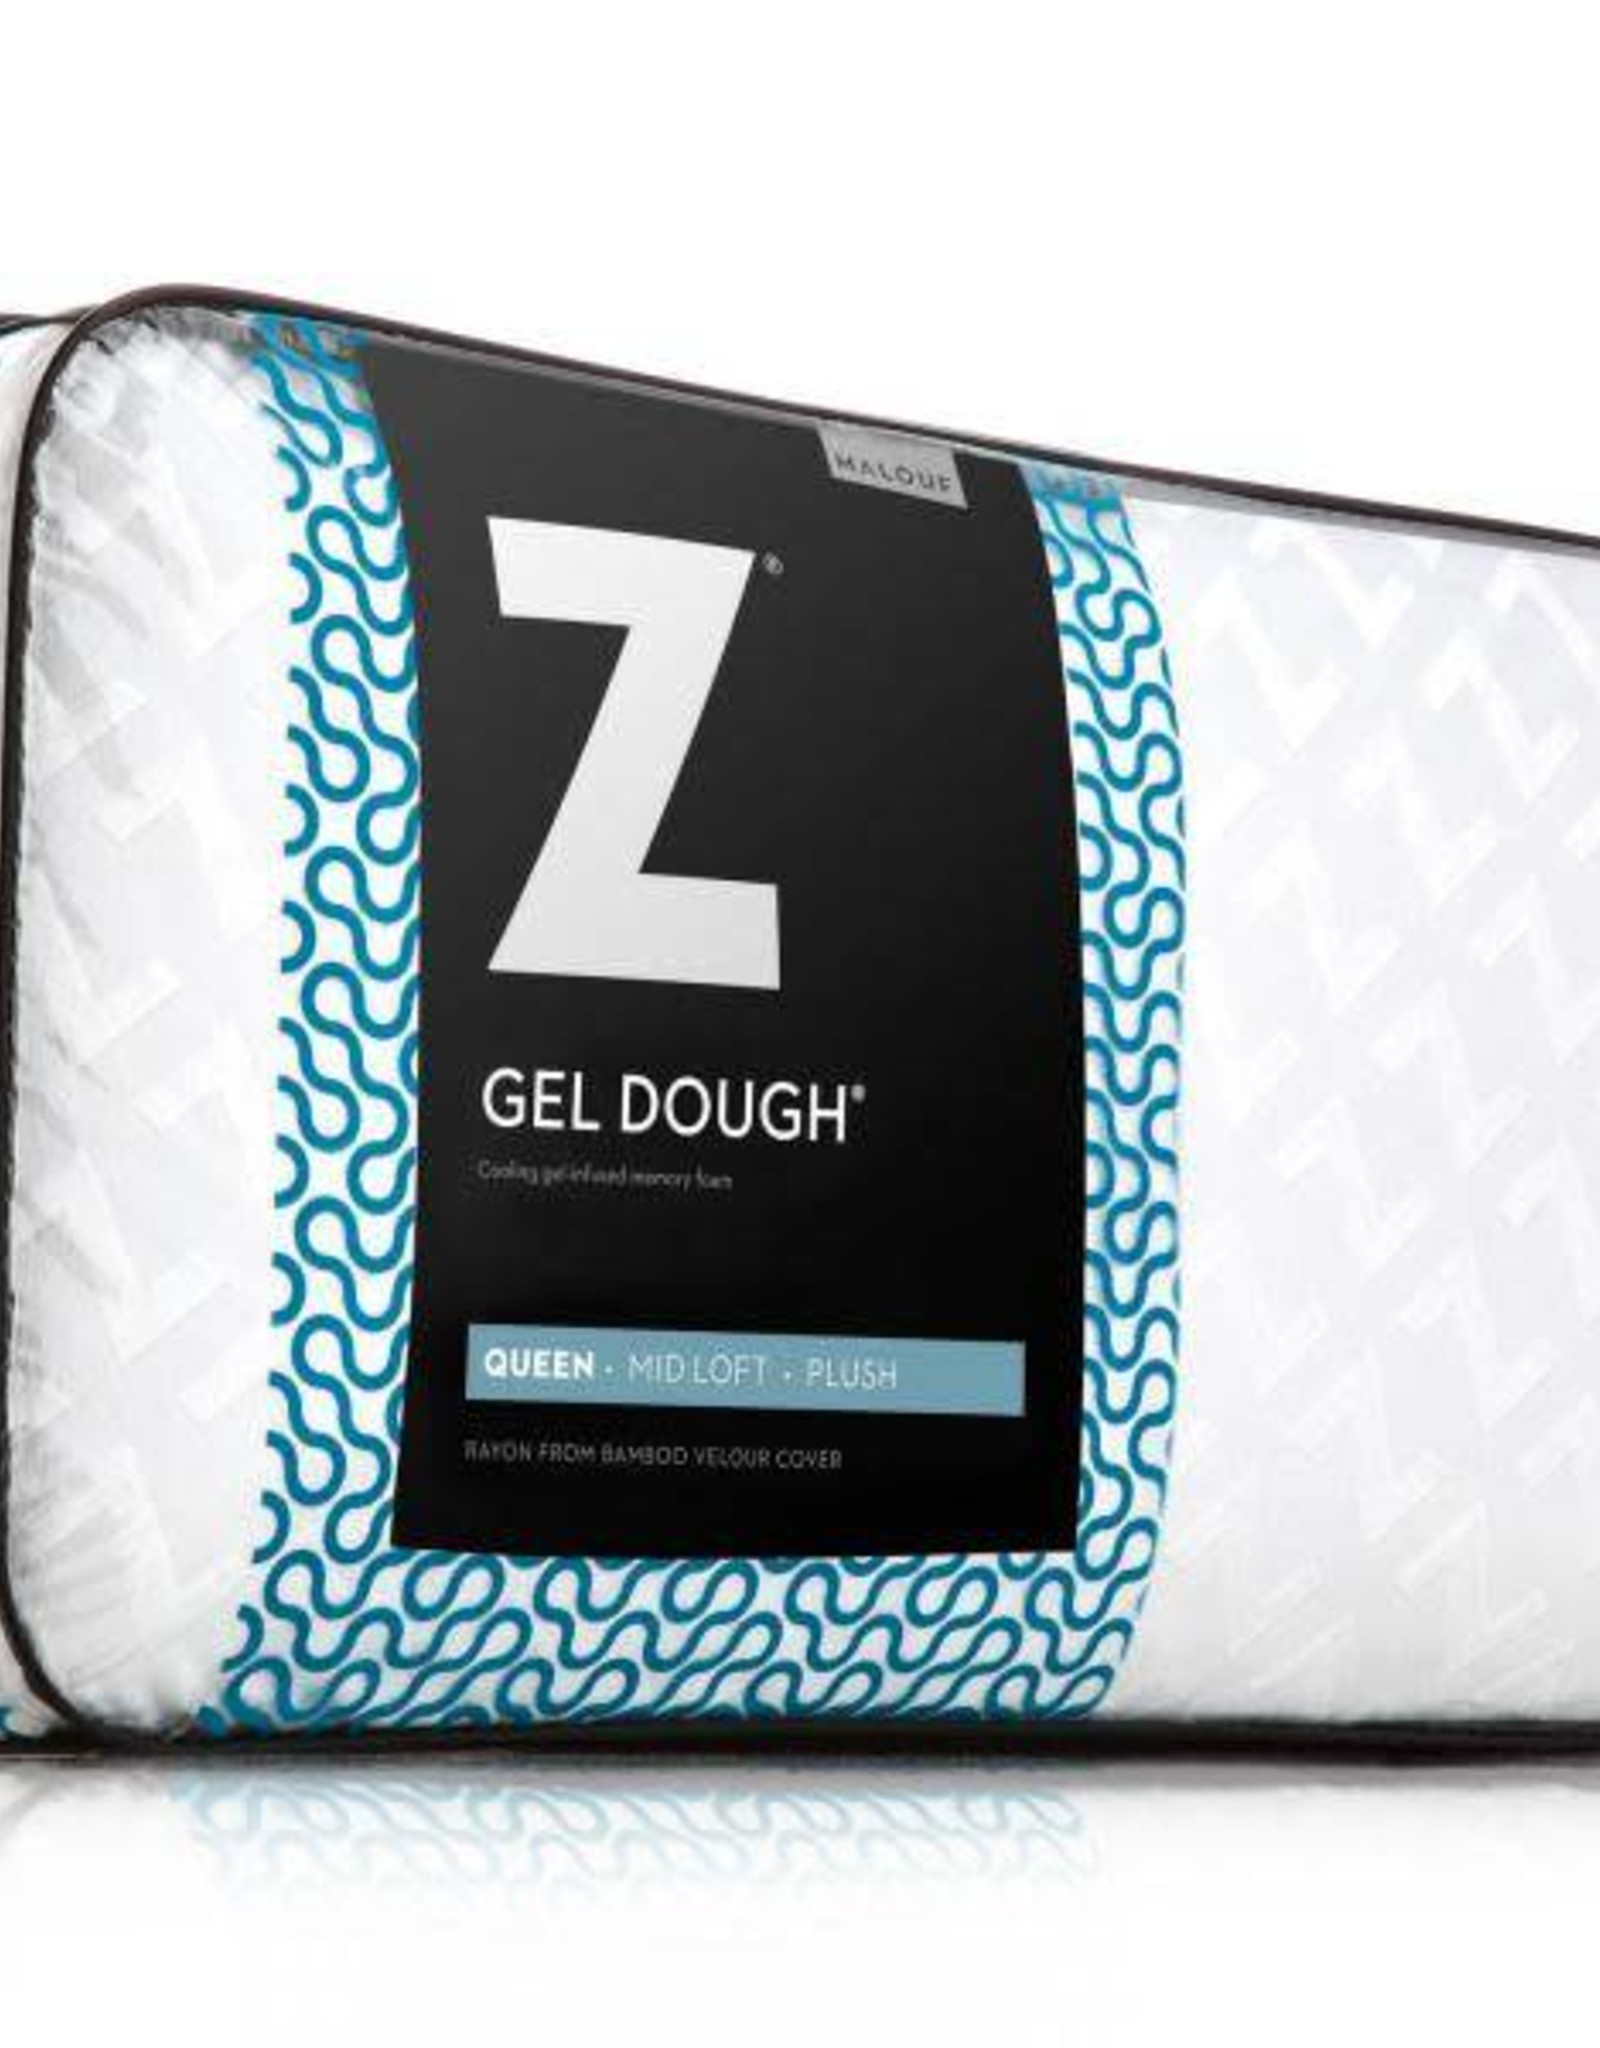 malouf z gel infused dough pillow mid loft